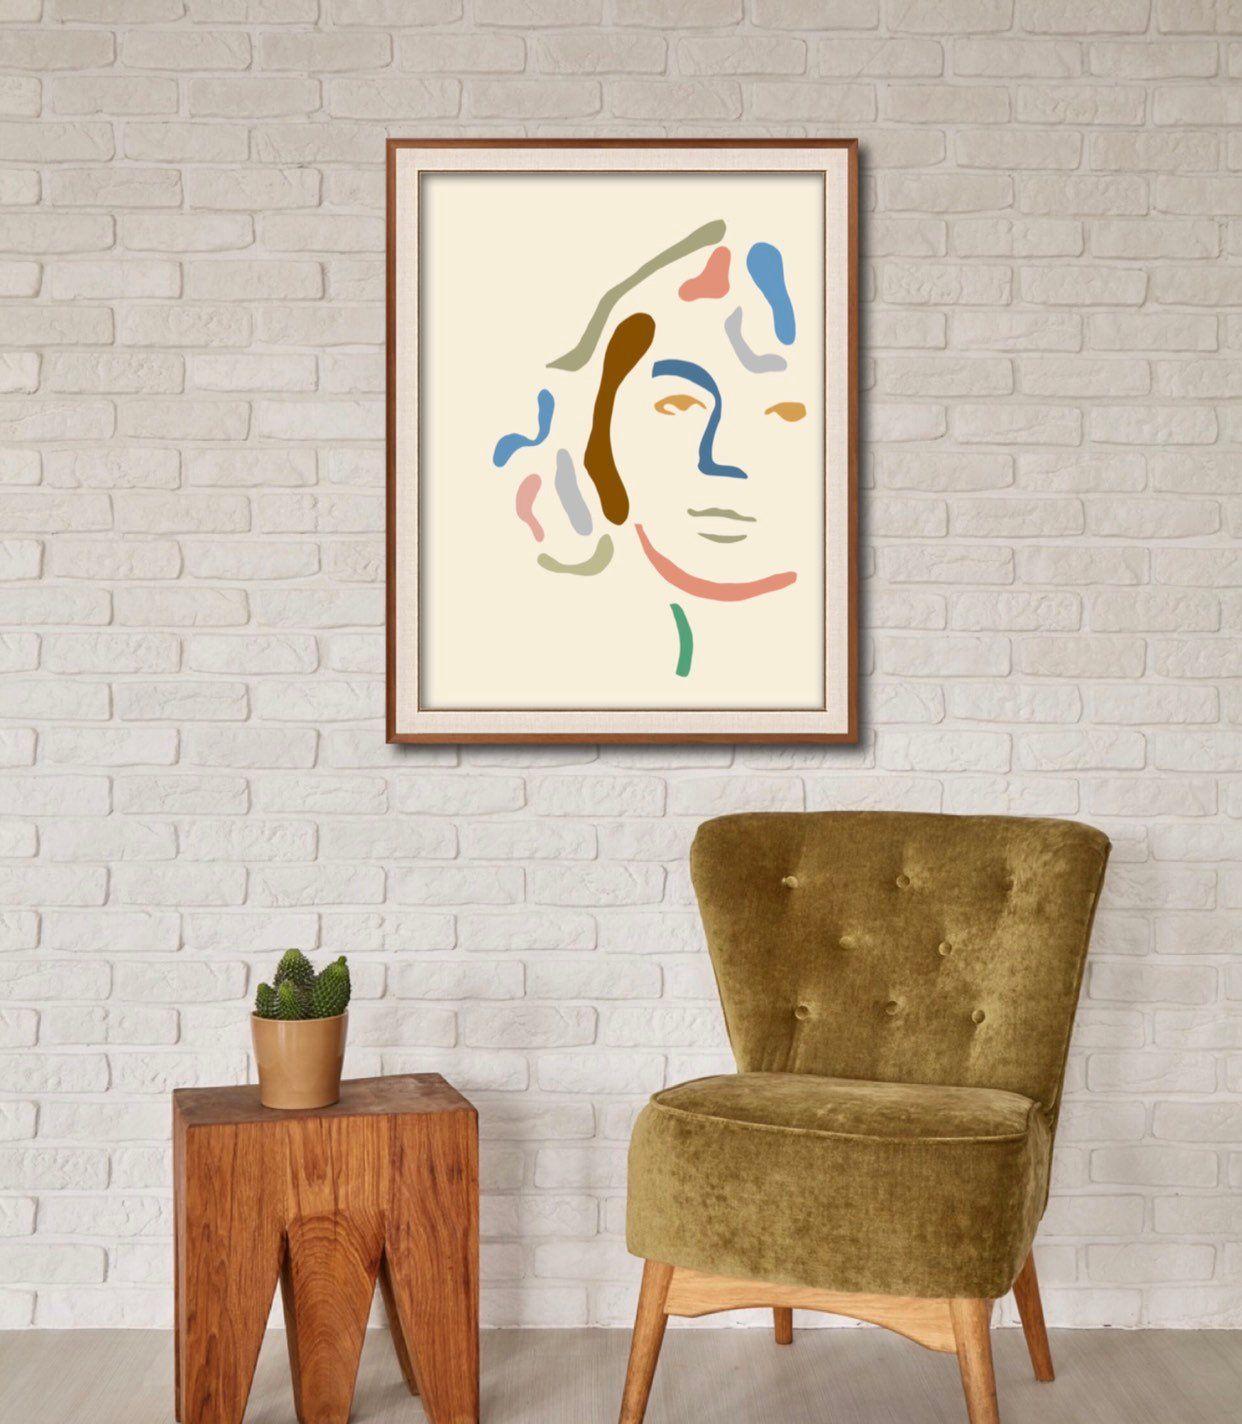 Abstract face art organic shapes nordic wall art modern